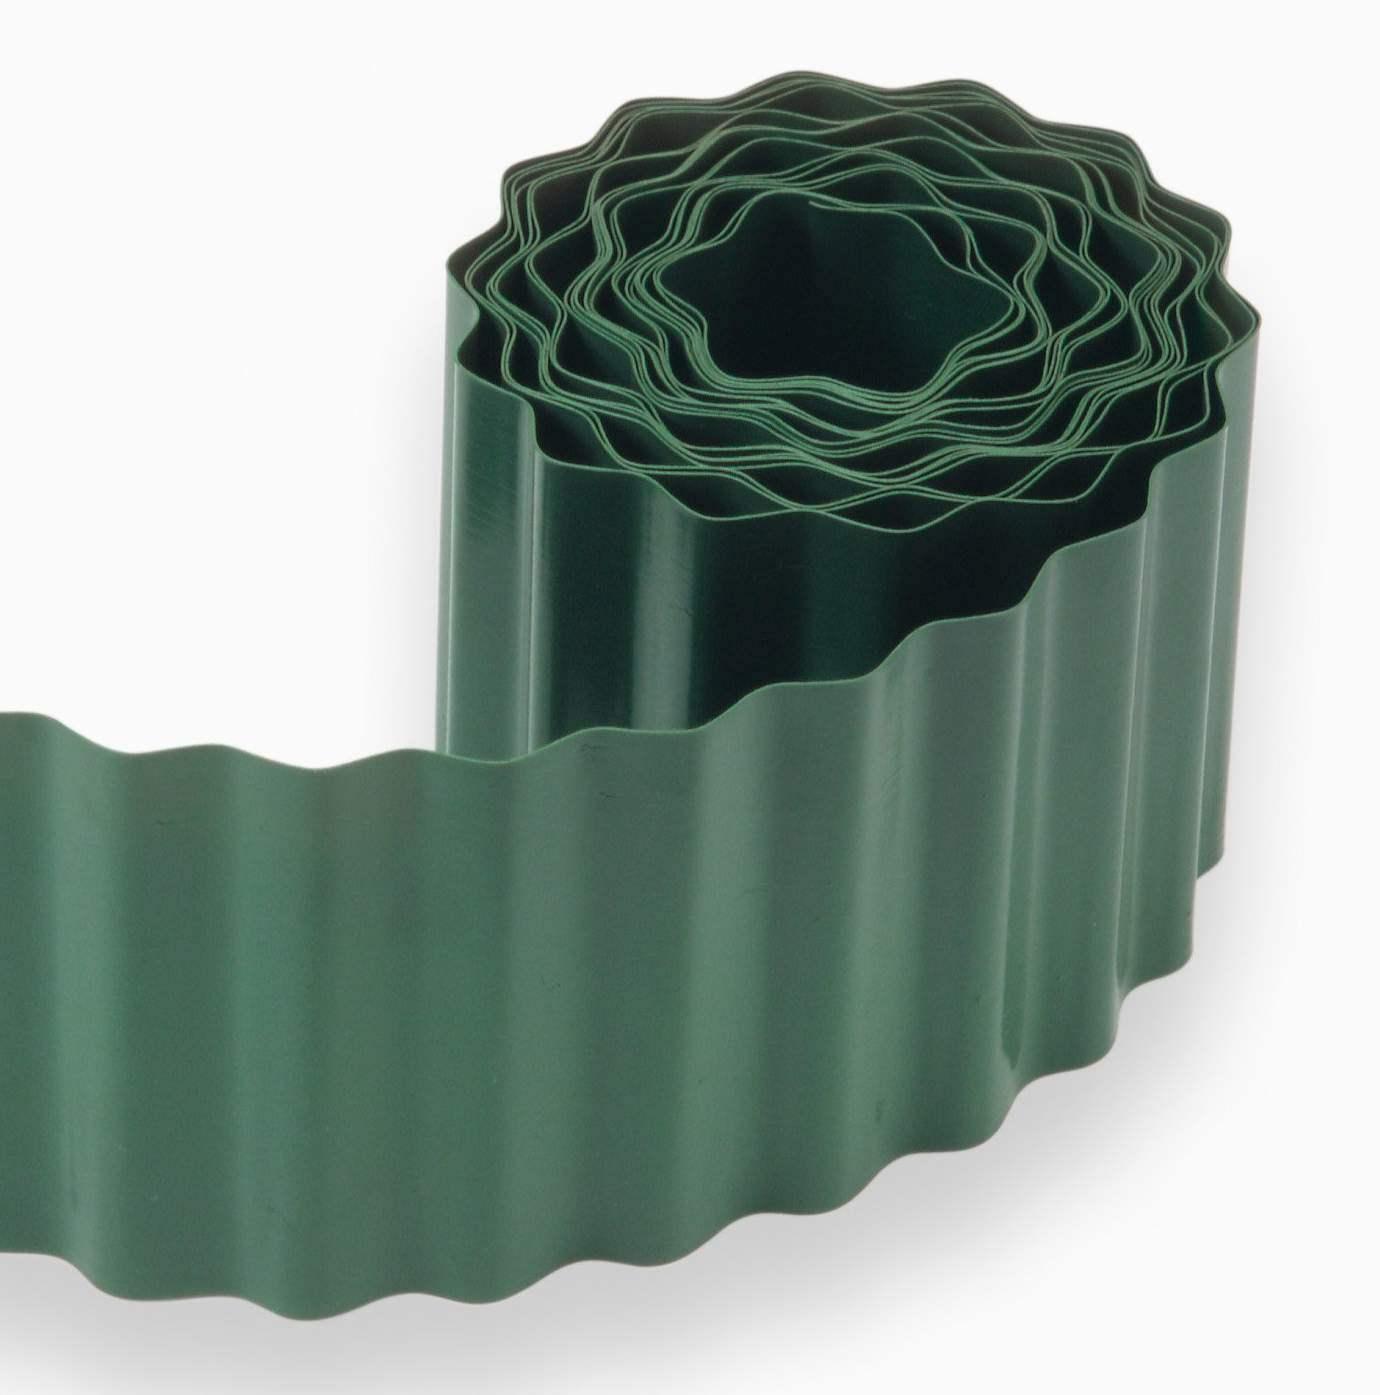 Plastic Garden Edging Masters : Plastic edging for gardens images